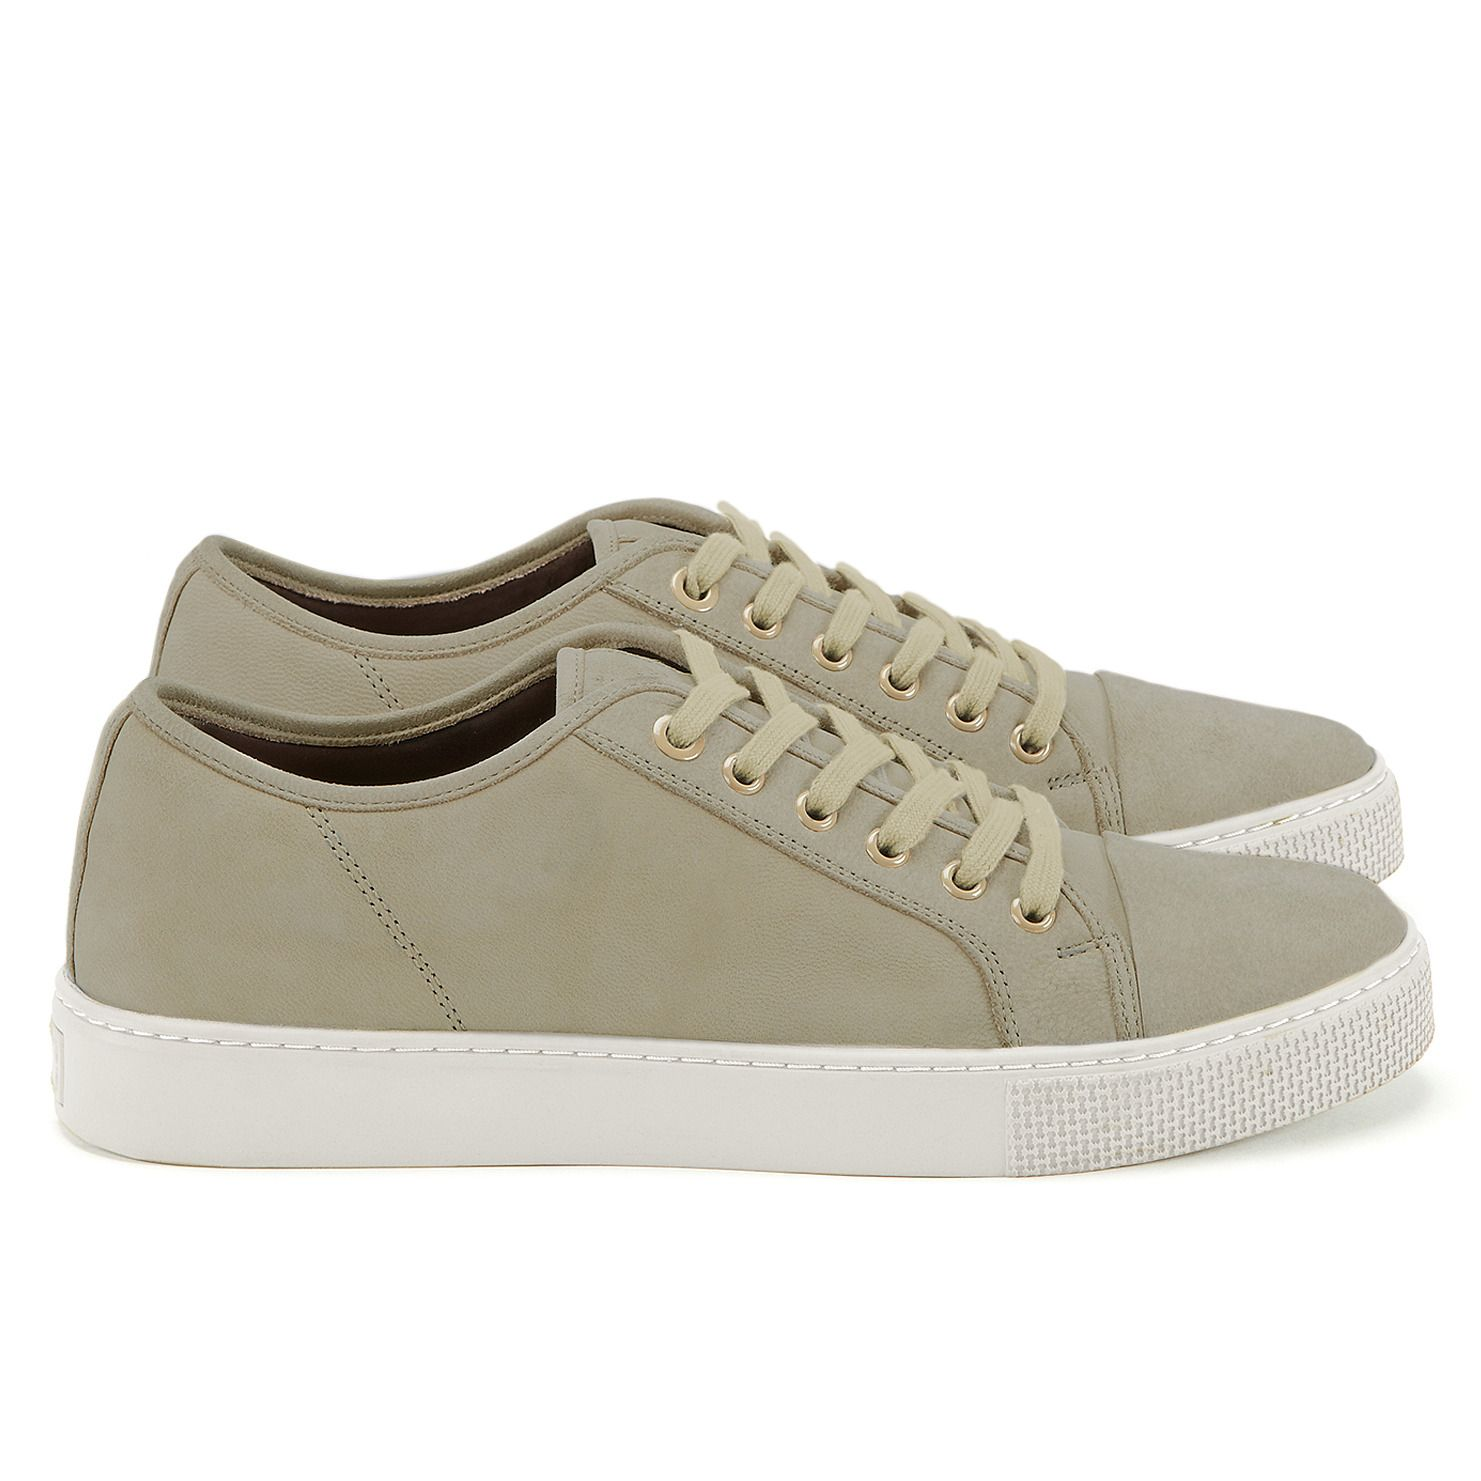 1aec9ce24b SNAIR - men's shoes mr. b's collection for sale at ALDO Shoes ...